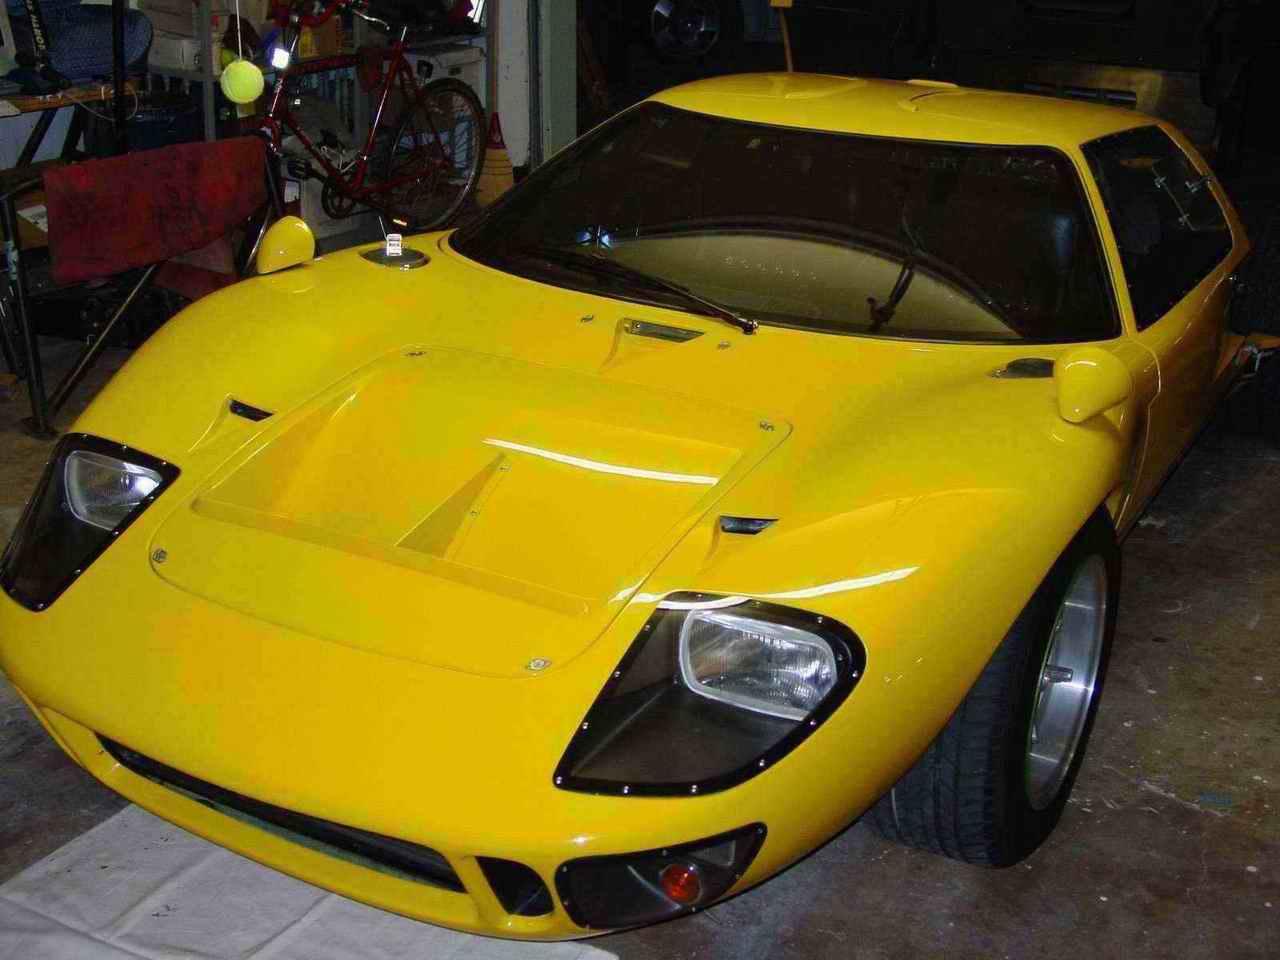 ERA GT 40 MK1 #2043-27678-left-front-high-low-res-jpg